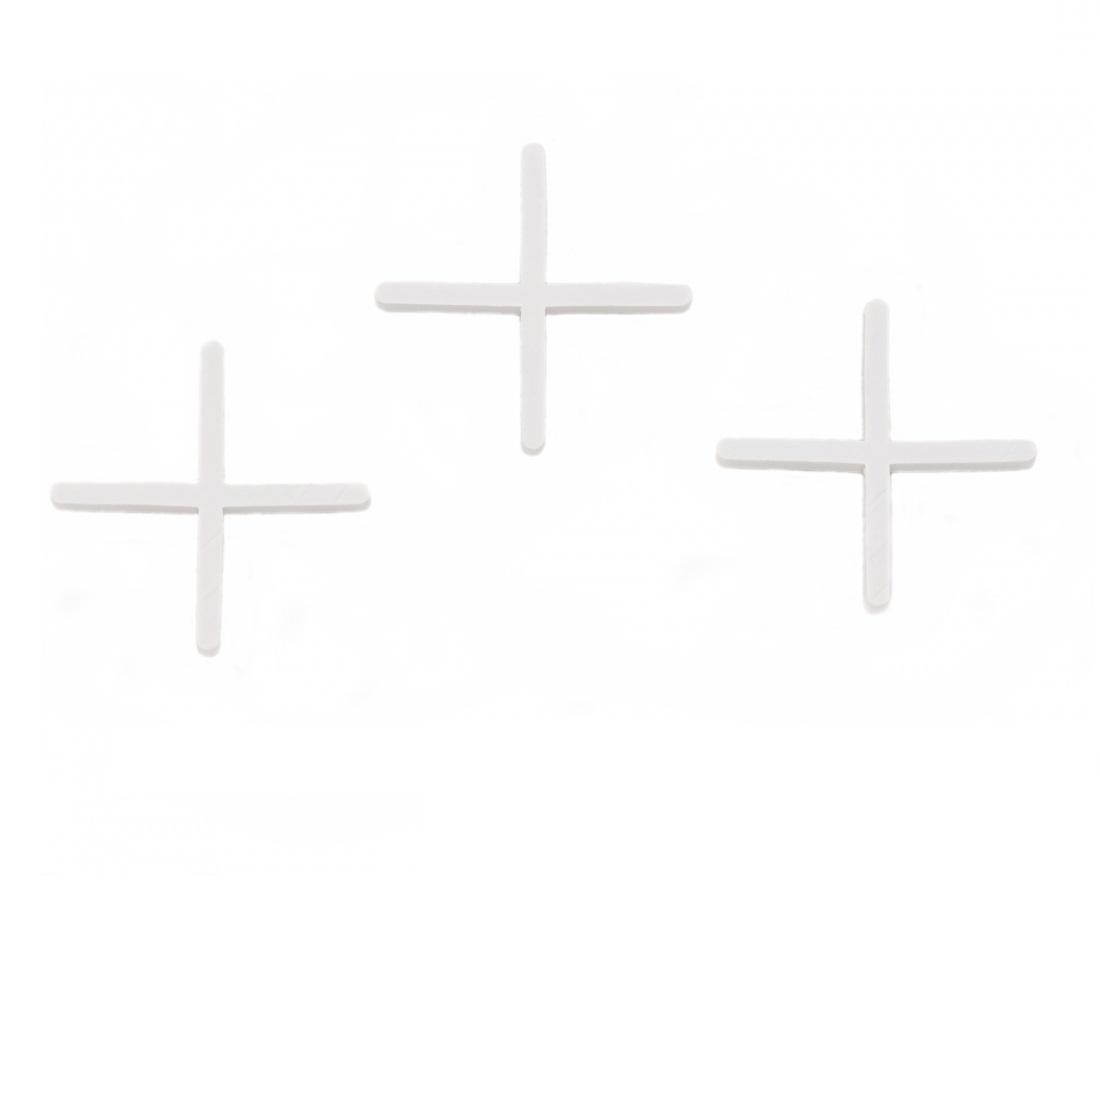 Крестики для плитки 3d крестики 2 мм (200шт)